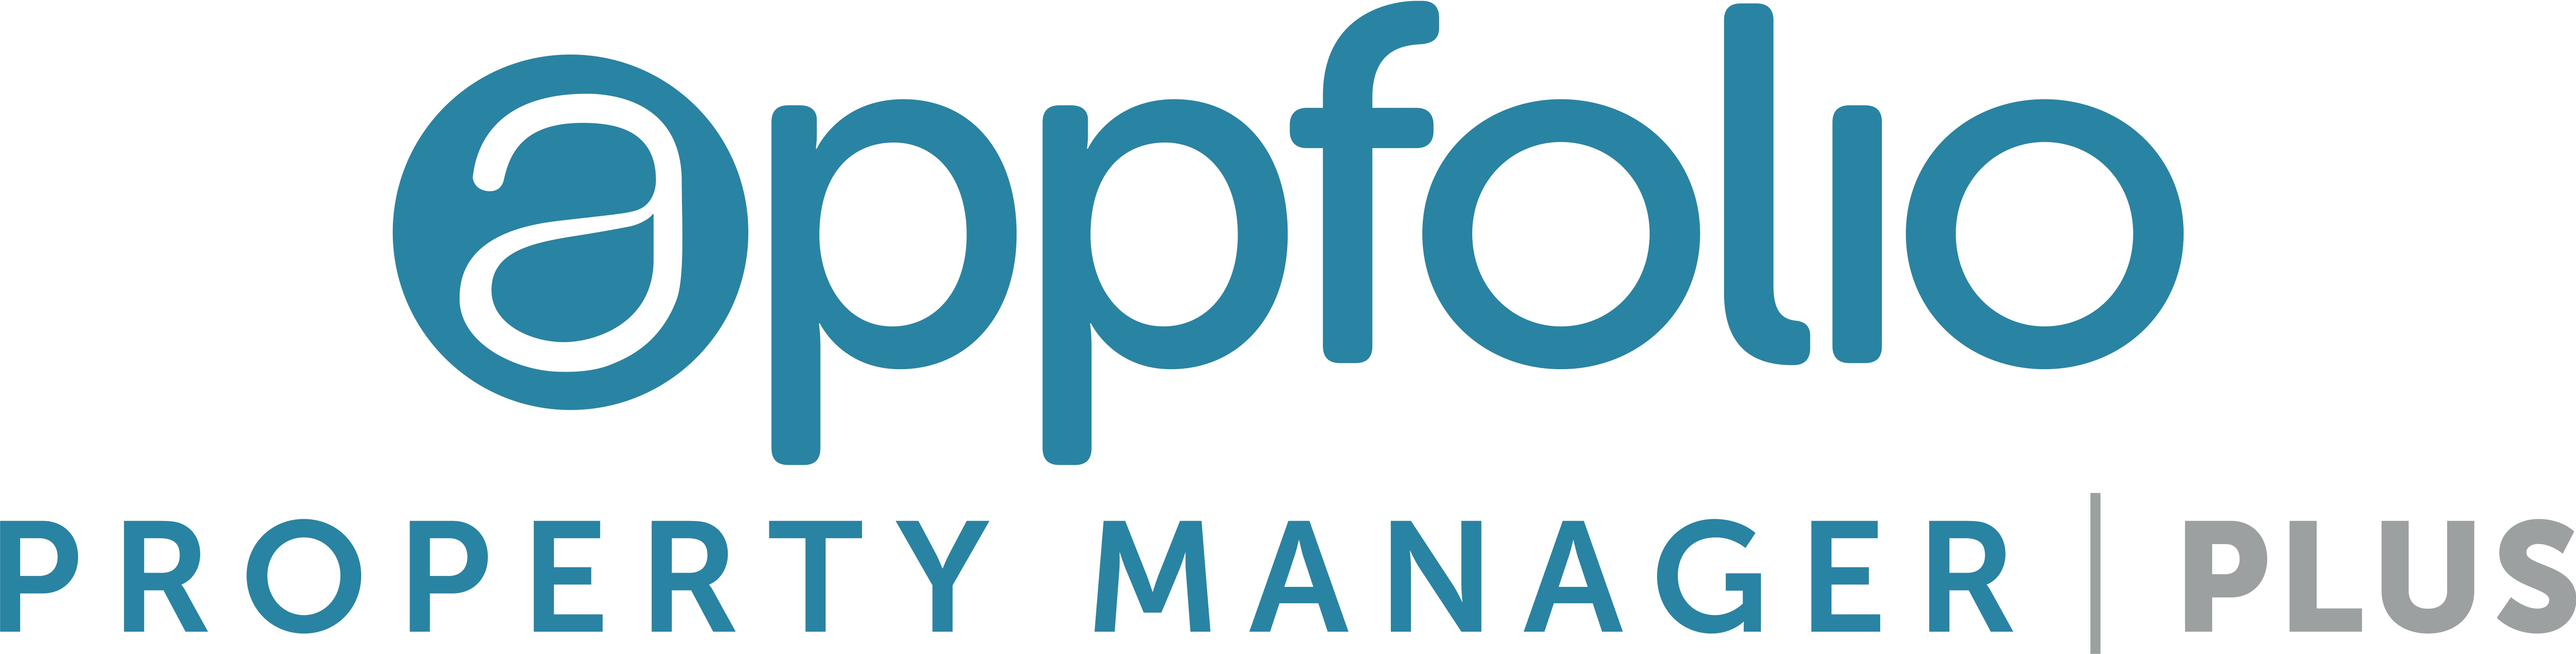 AppFolioPropertyManager_PLUS_Logo